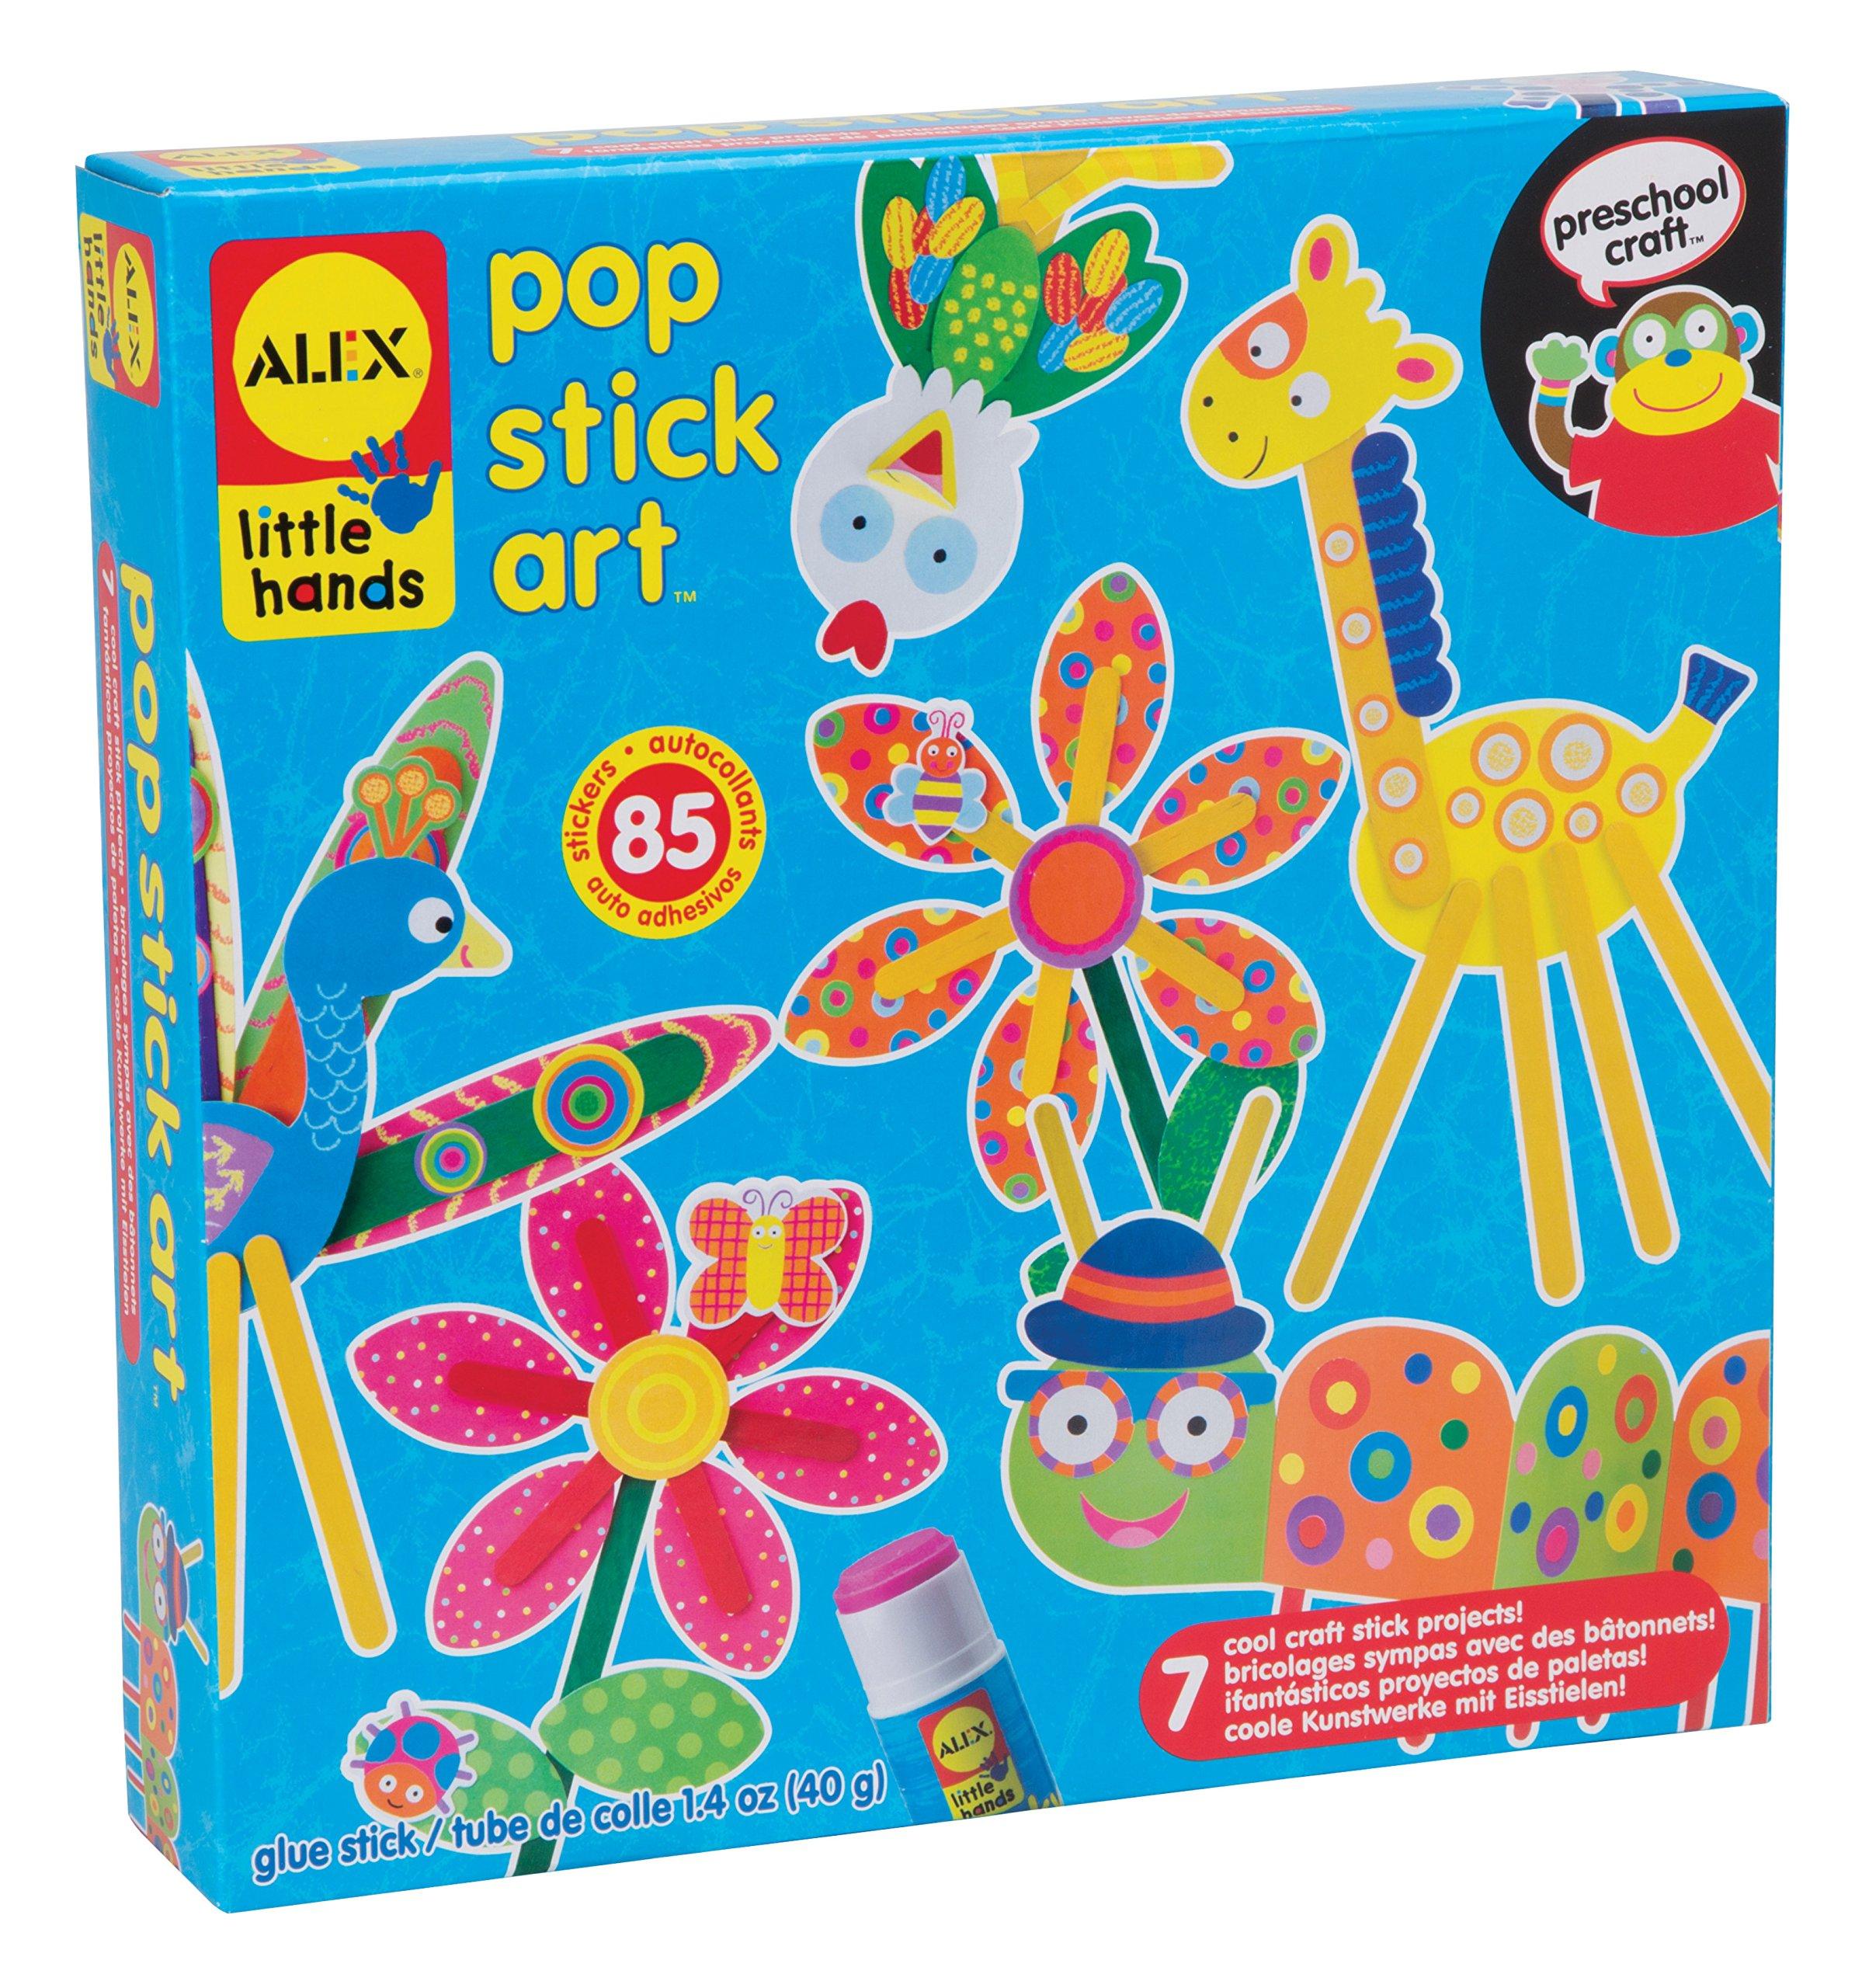 ALEX Toys Little Hands Pop Stick Art Craft Kit by ALEX Toys